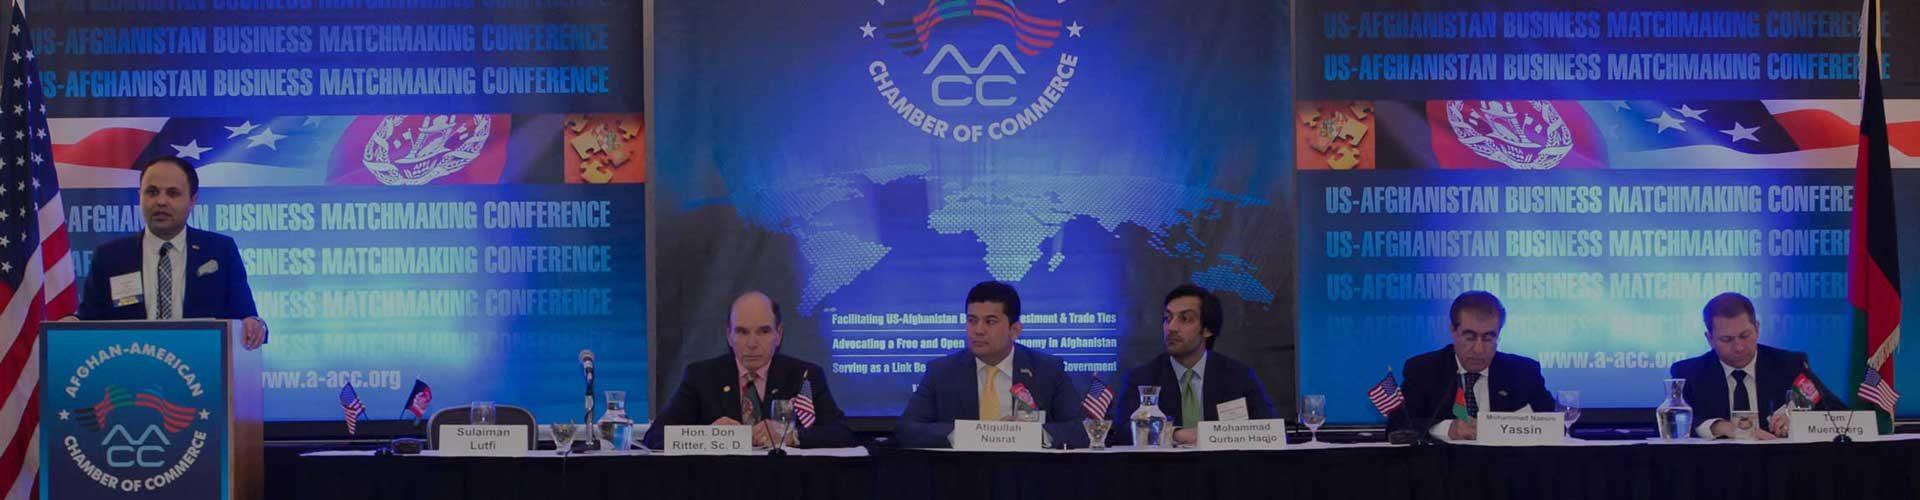 india china business matchmaking symposium sort og hvid romantik dating site